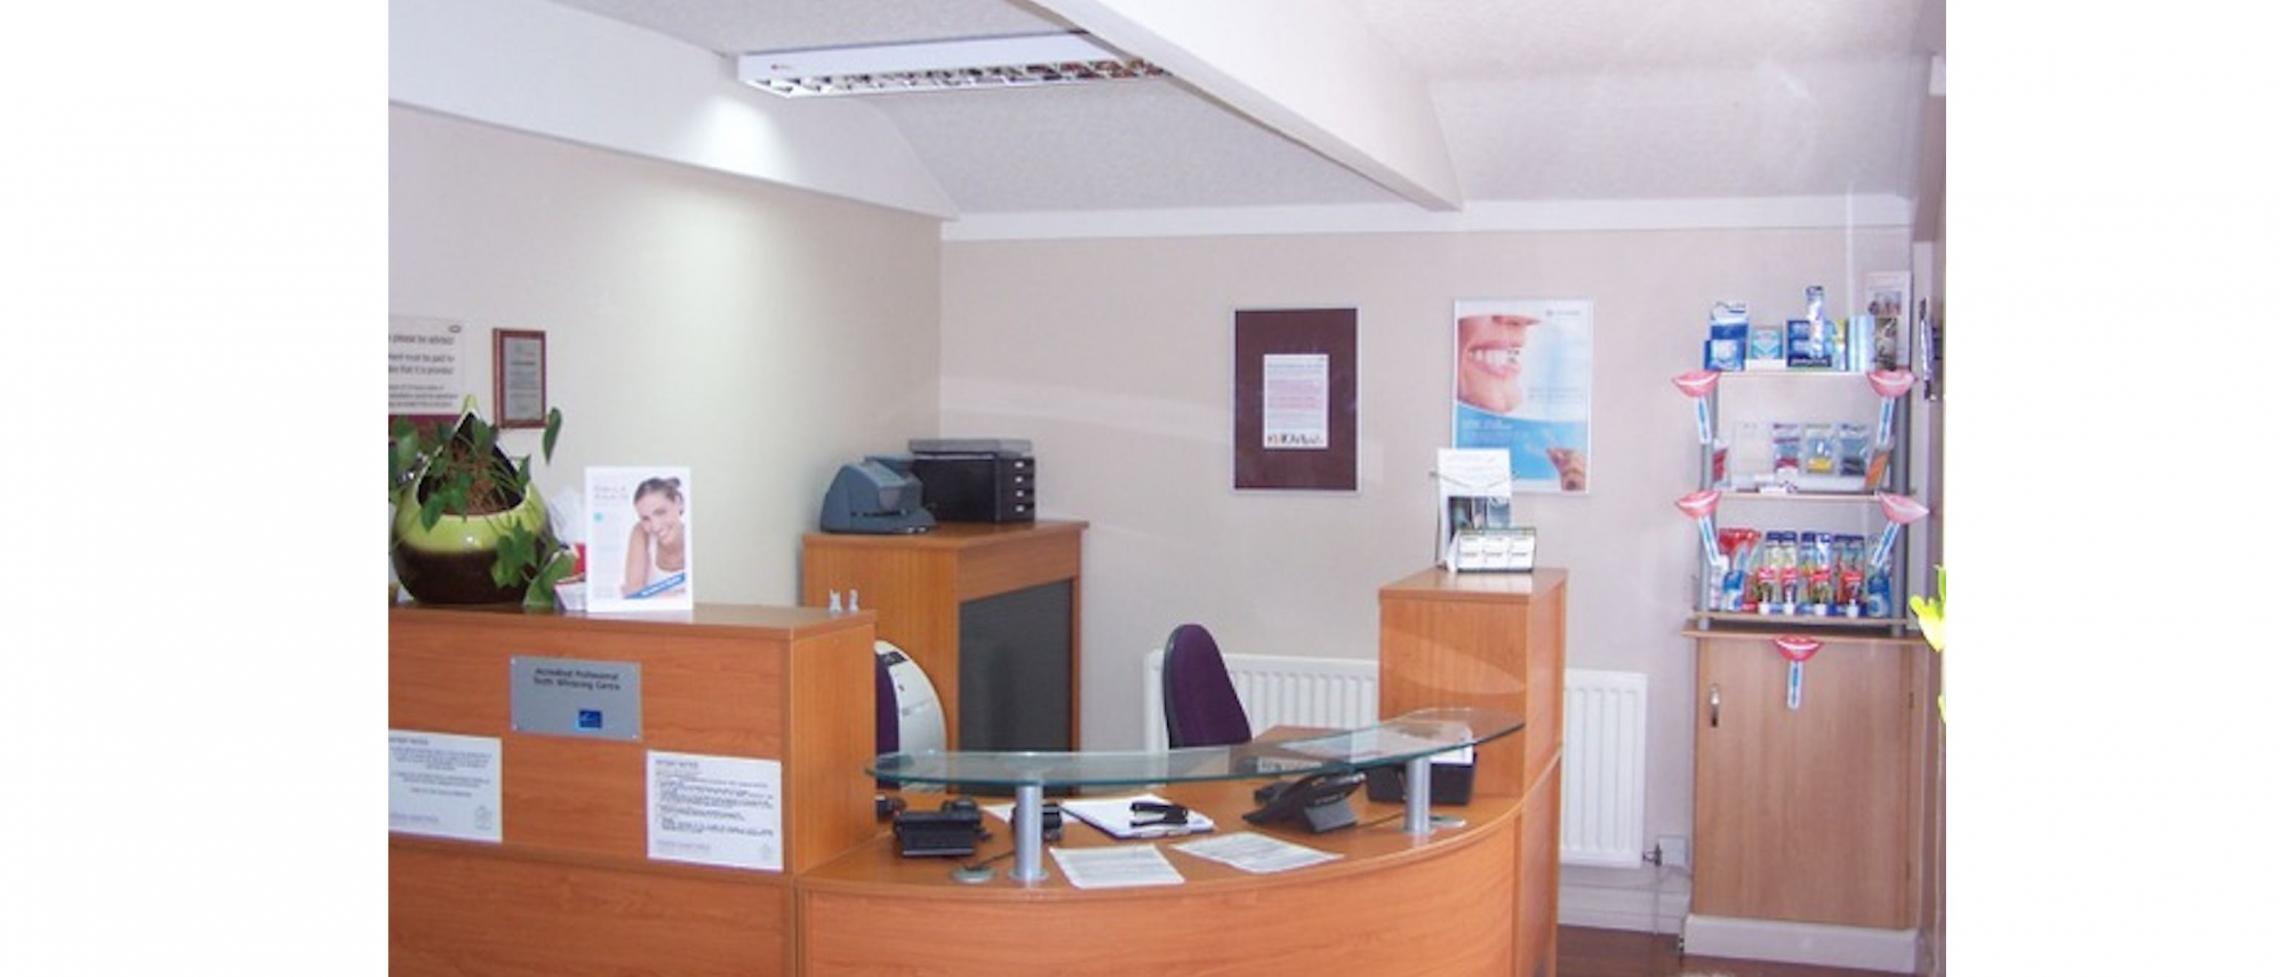 Our beautiful reception area